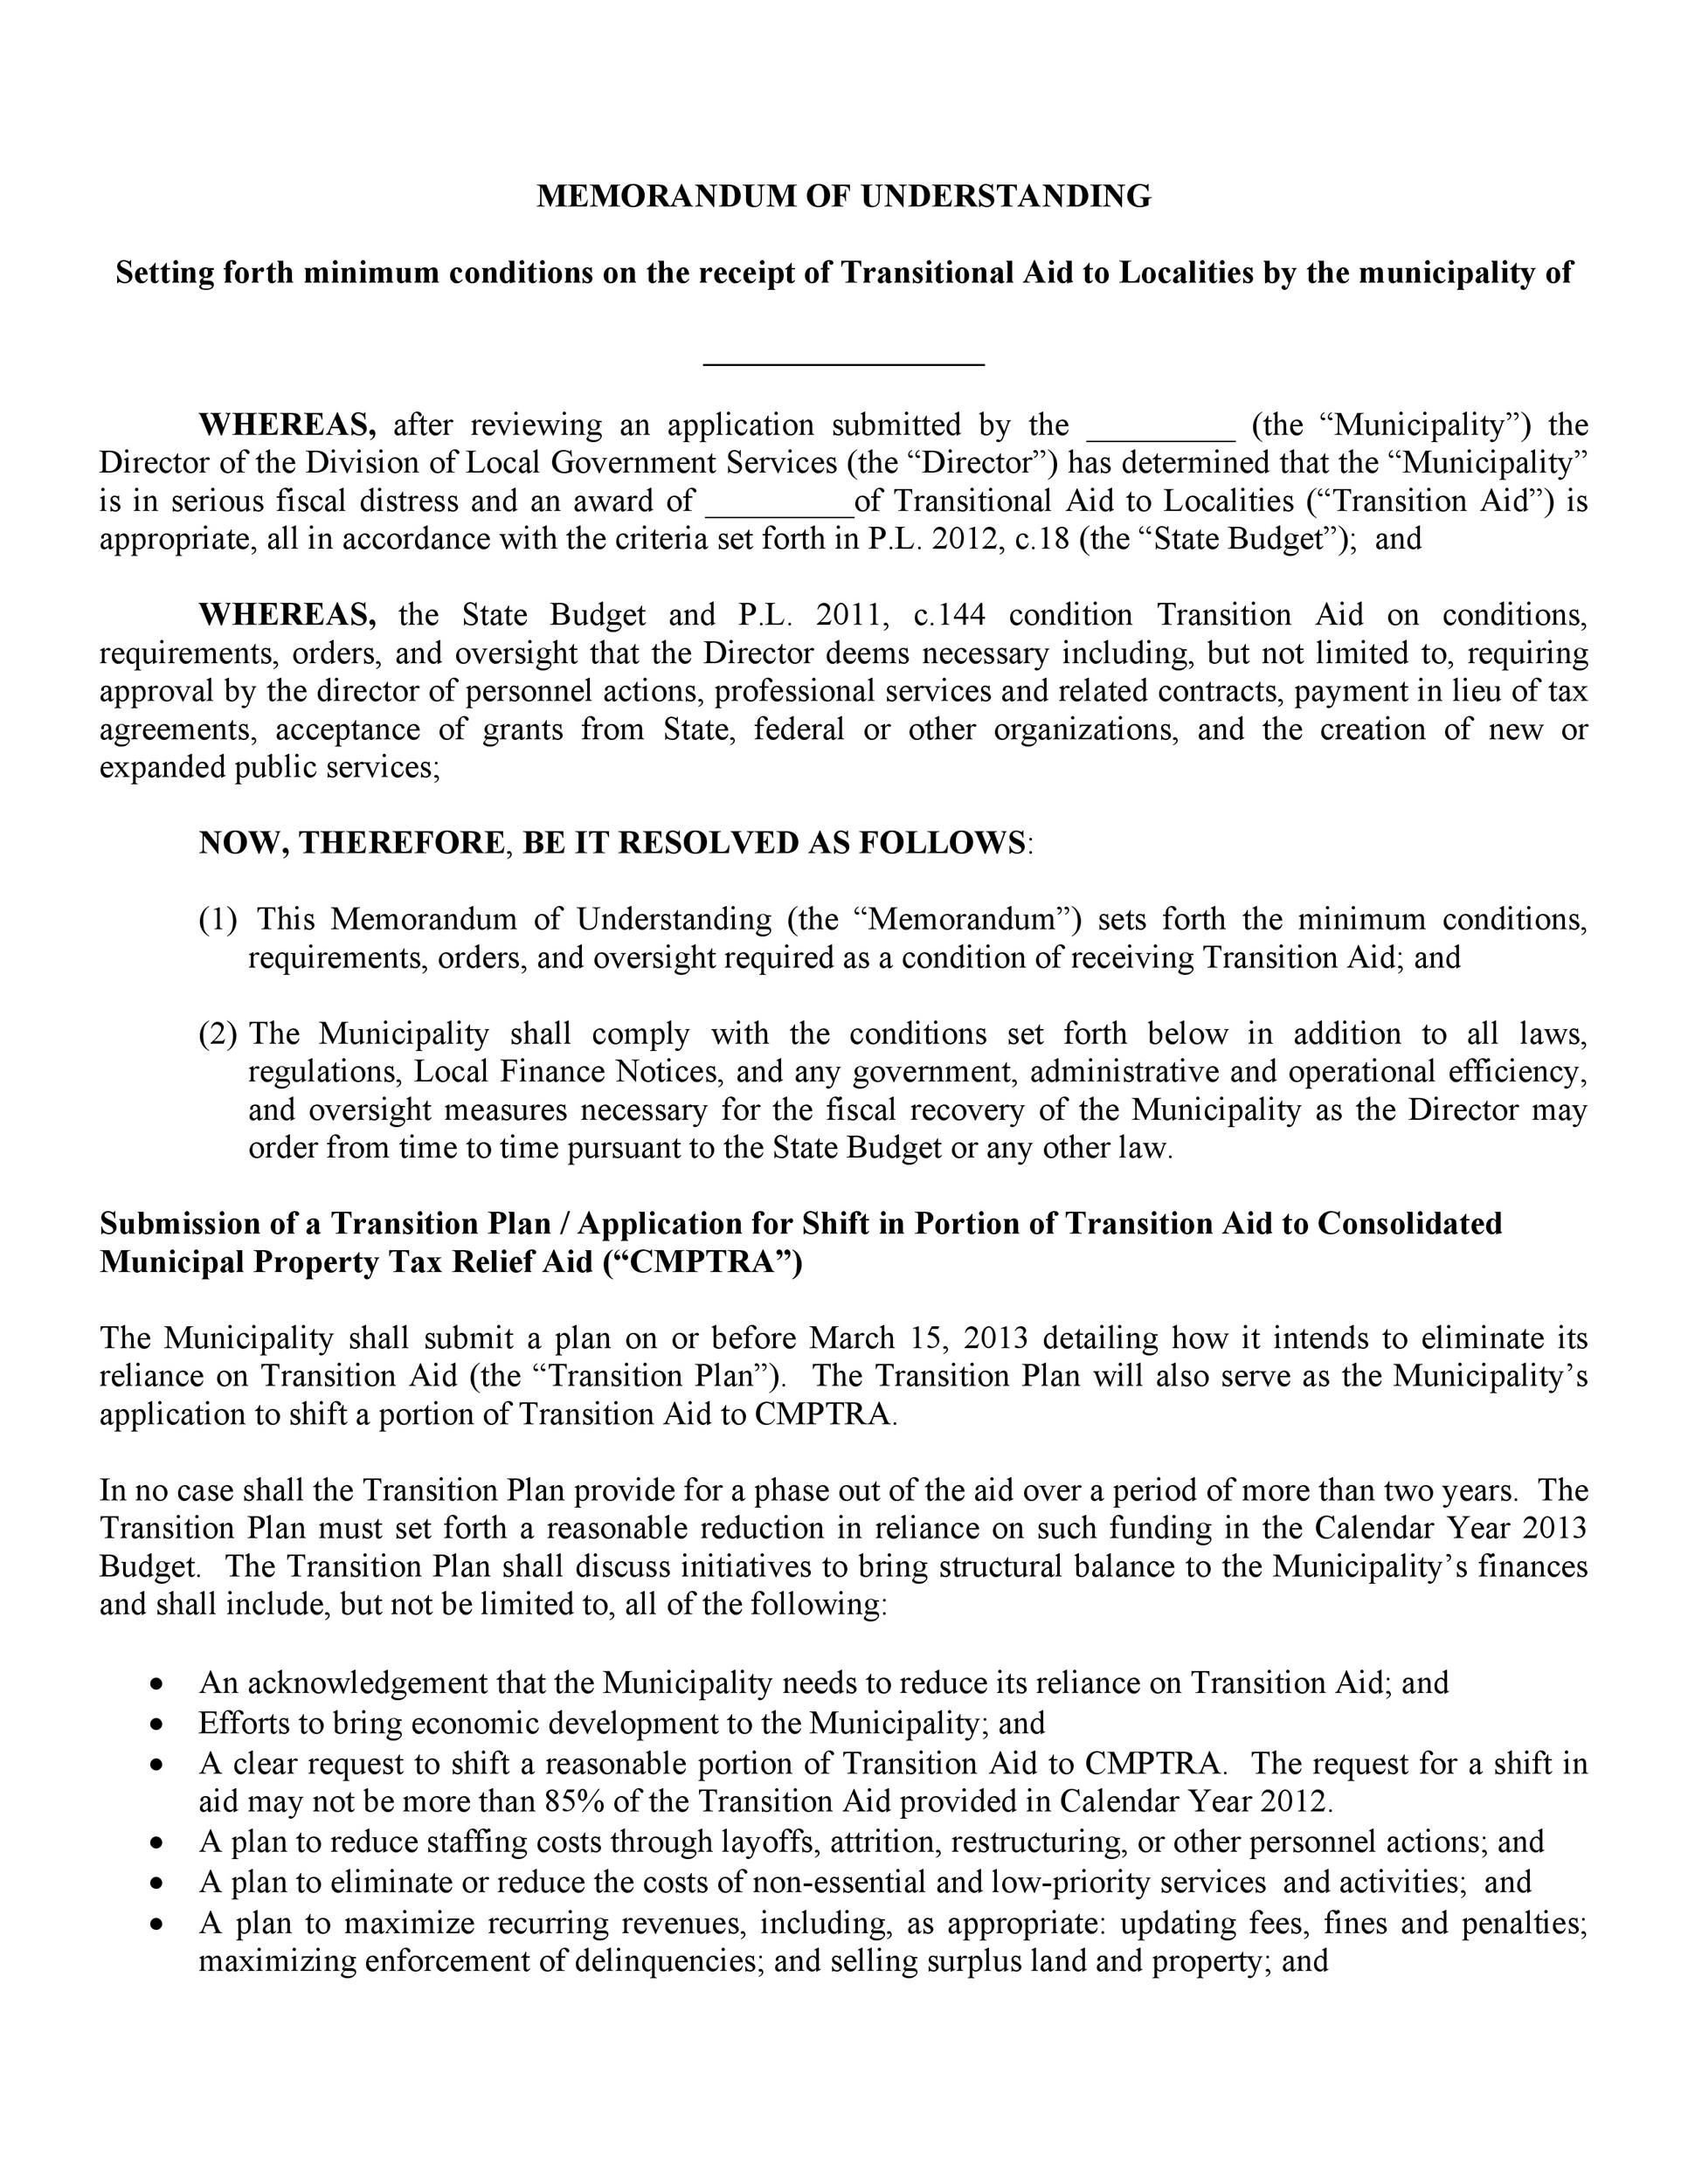 Free Memorandum of Understanding Template 21